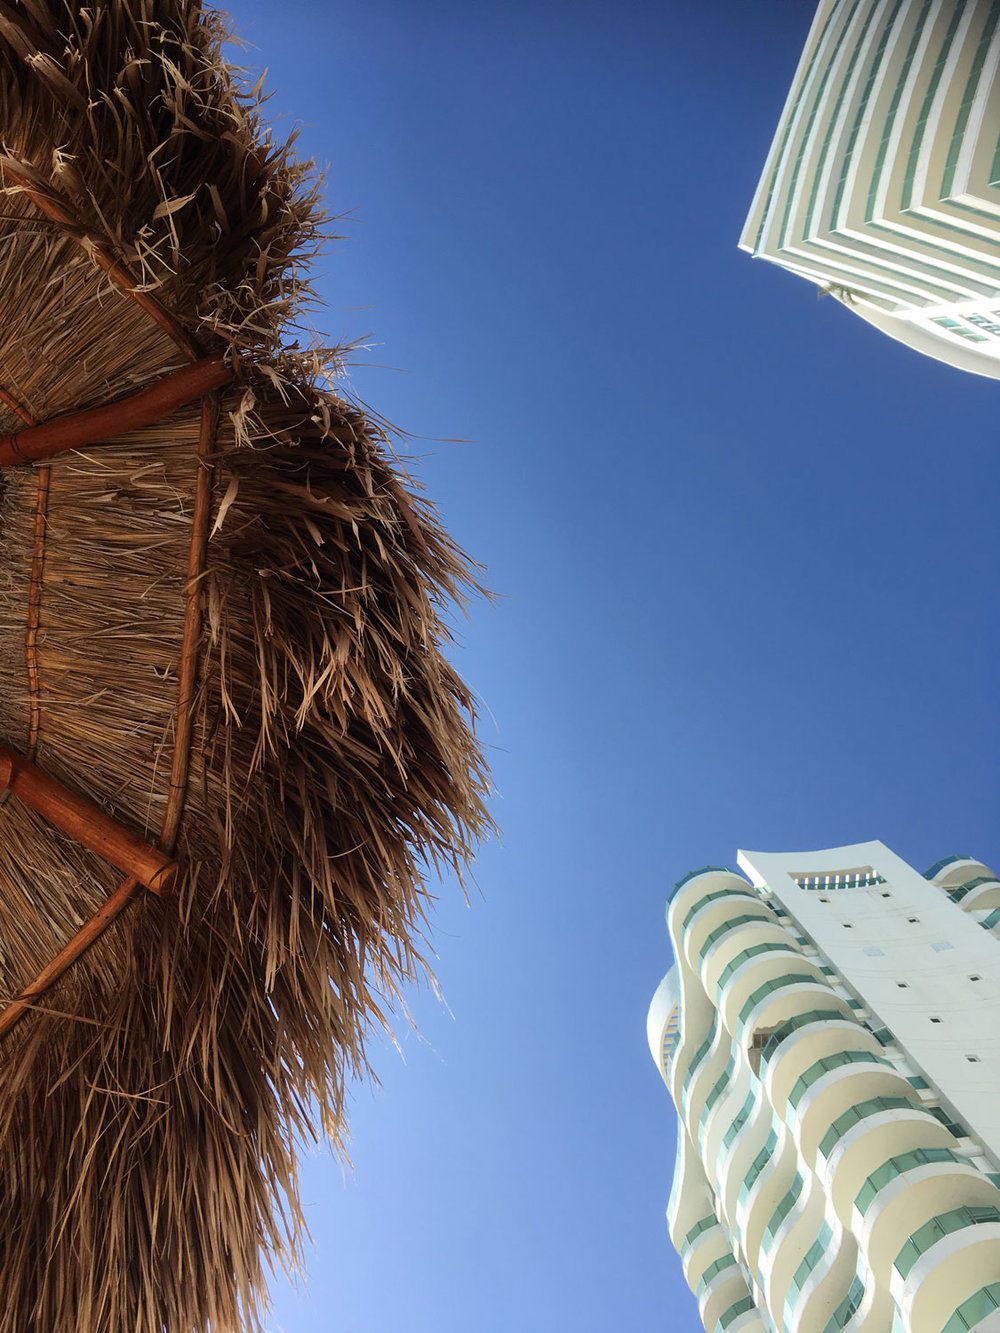 Hammocks_and_Ruins_Things_To_Do_Cancun_Explore_Riviera_Maya_Mexico_Cancun_Beaches_Playa_Chacmul_21.jpg